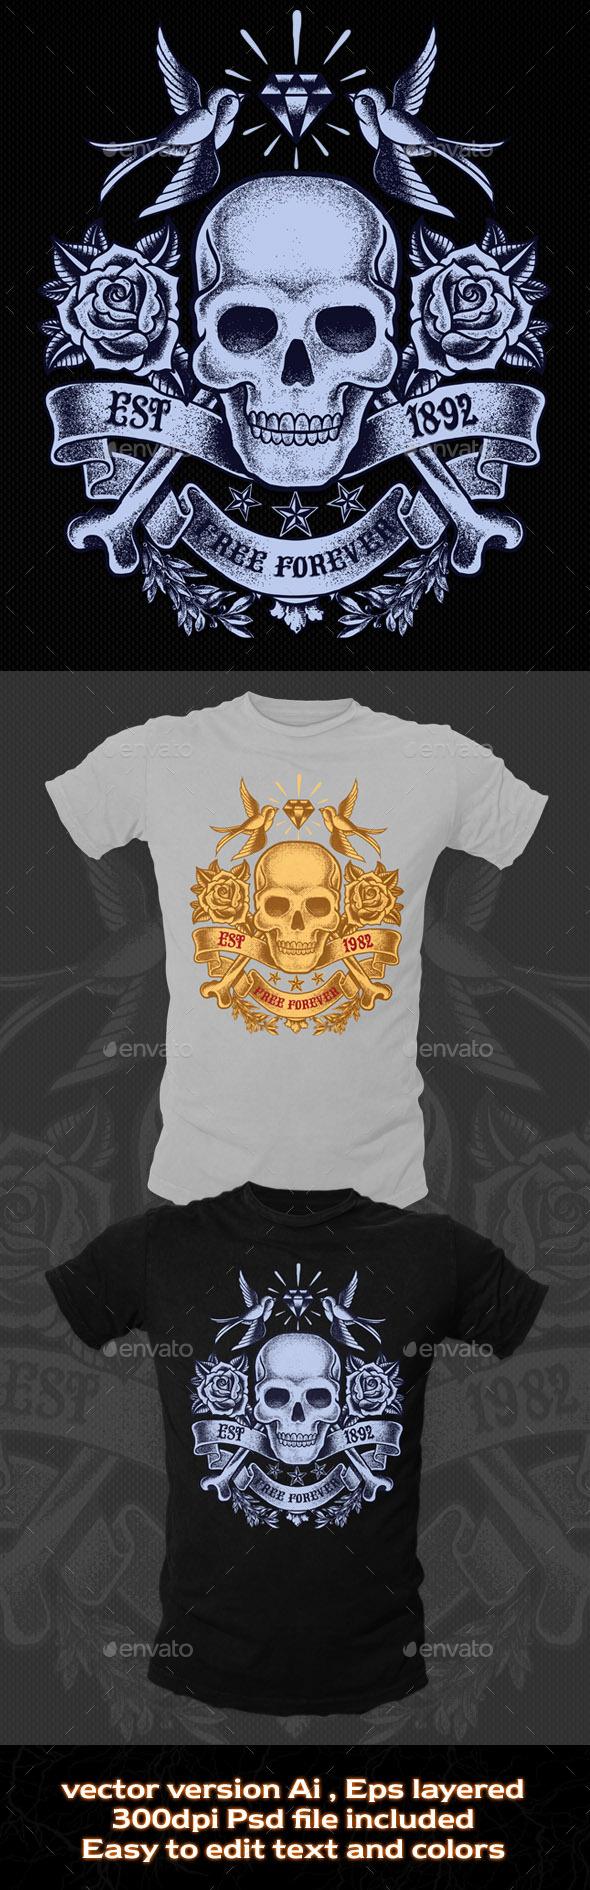 Old Skull T-shirt Template - Grunge Designs